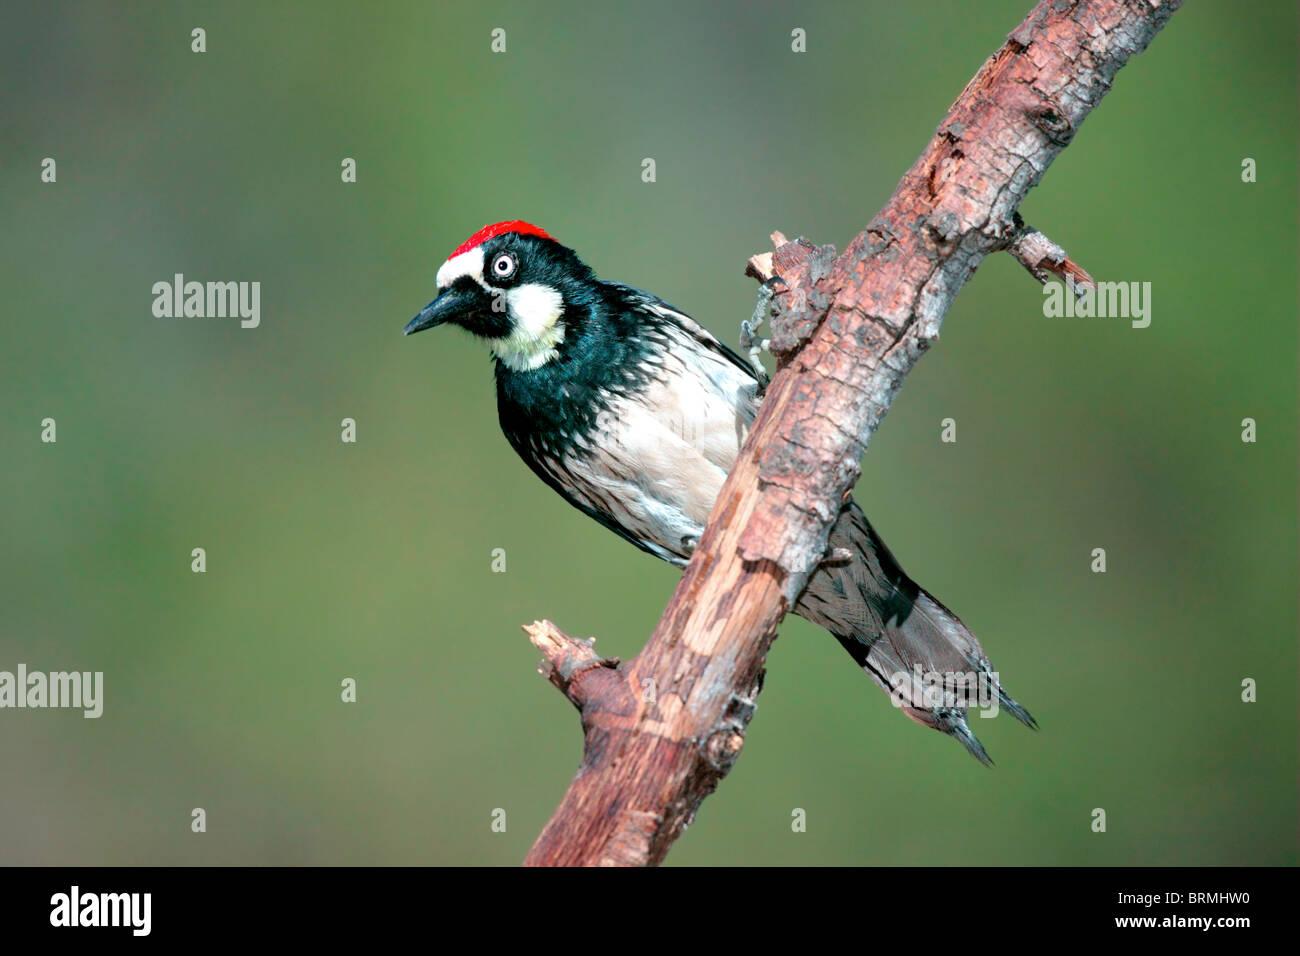 Acorn Woodpecker - Stock Image